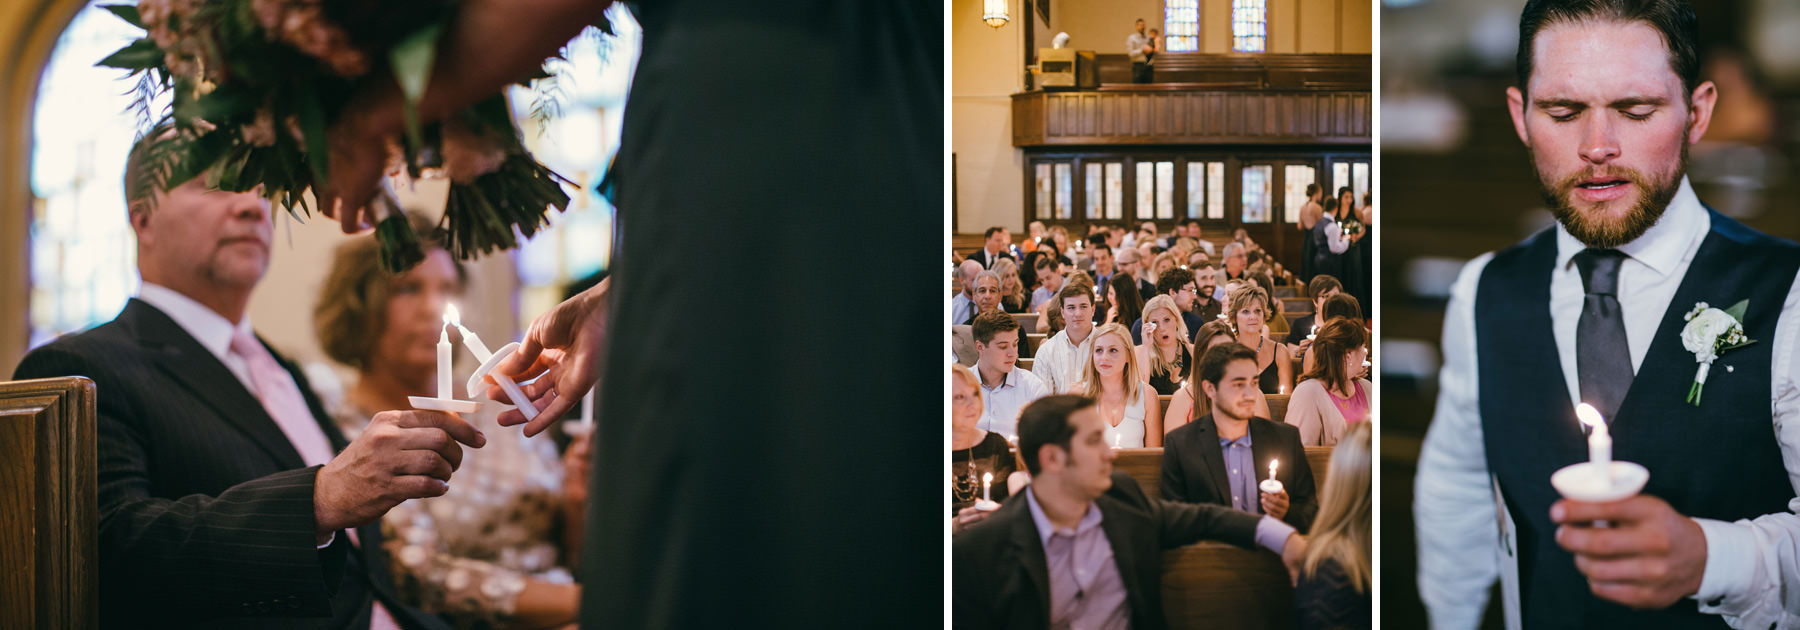 Kansas City Summer Wedding at the Guild_Kindling Wedding Photography Blog55.JPG